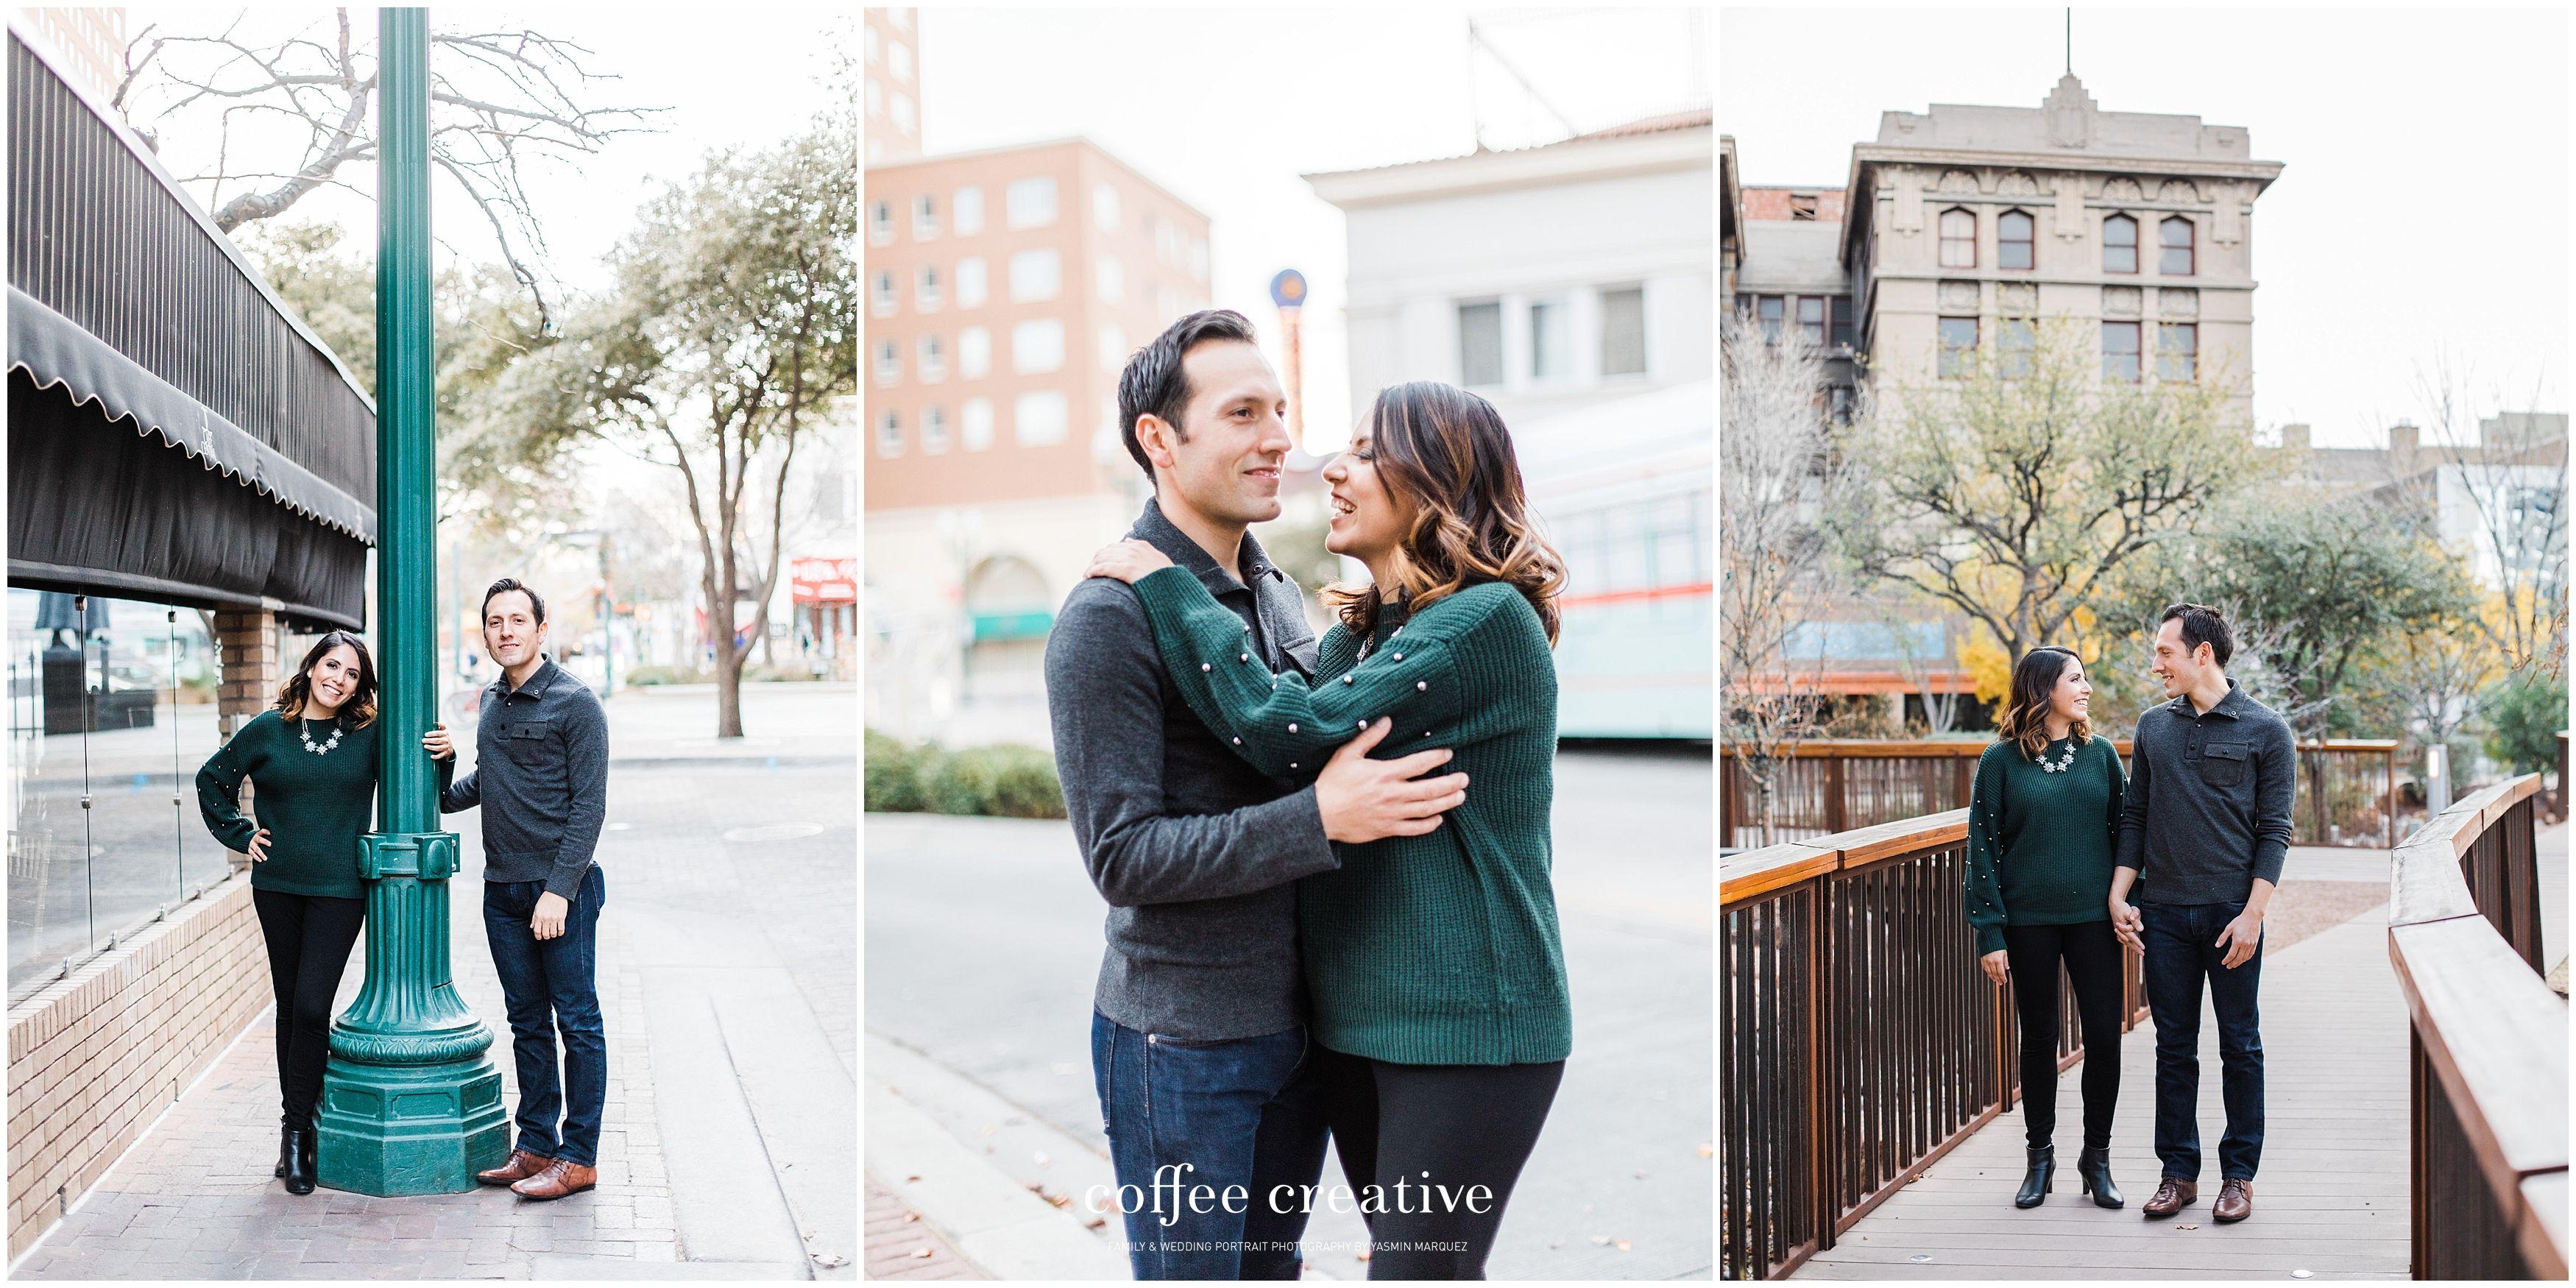 Pin By Marisabel Rubio On Wedding Family Wedding Photographer Wedding Photographers